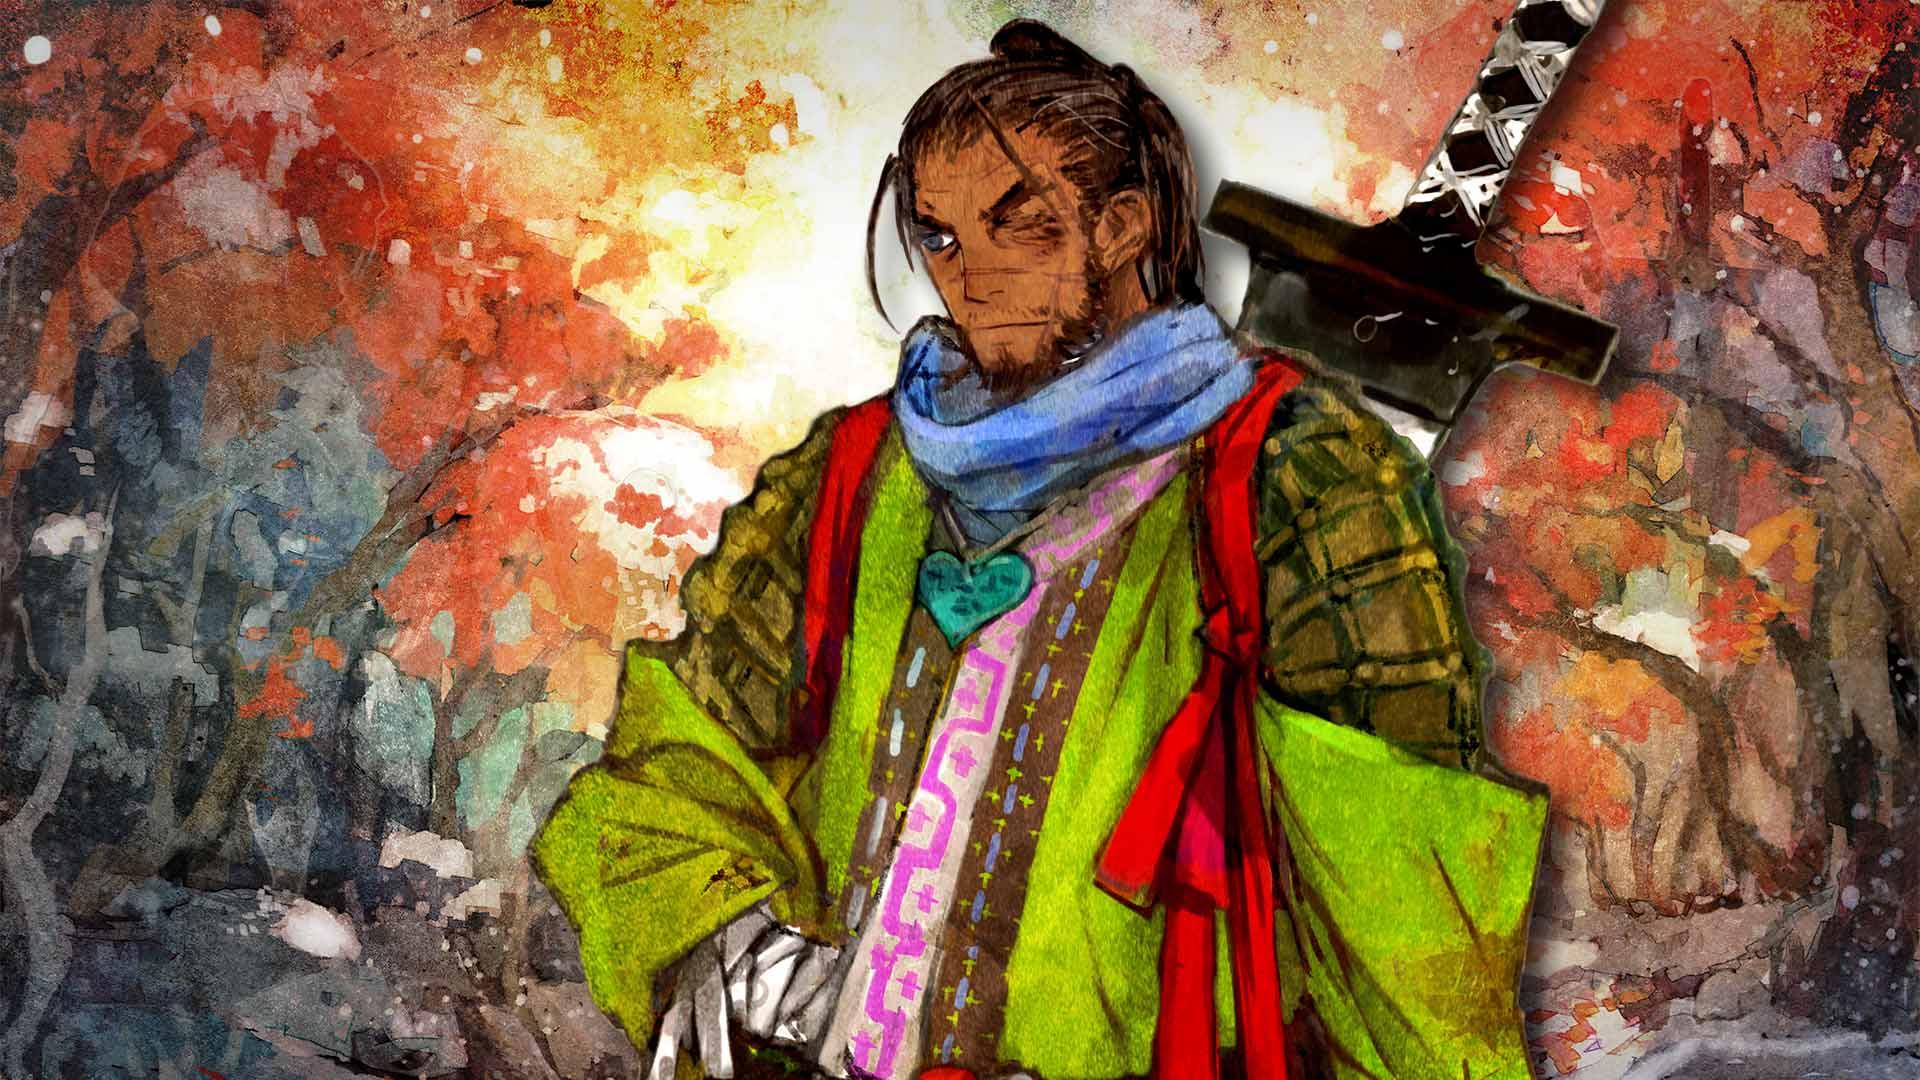 I Am Setsuna Wallpaper 008 Nidr